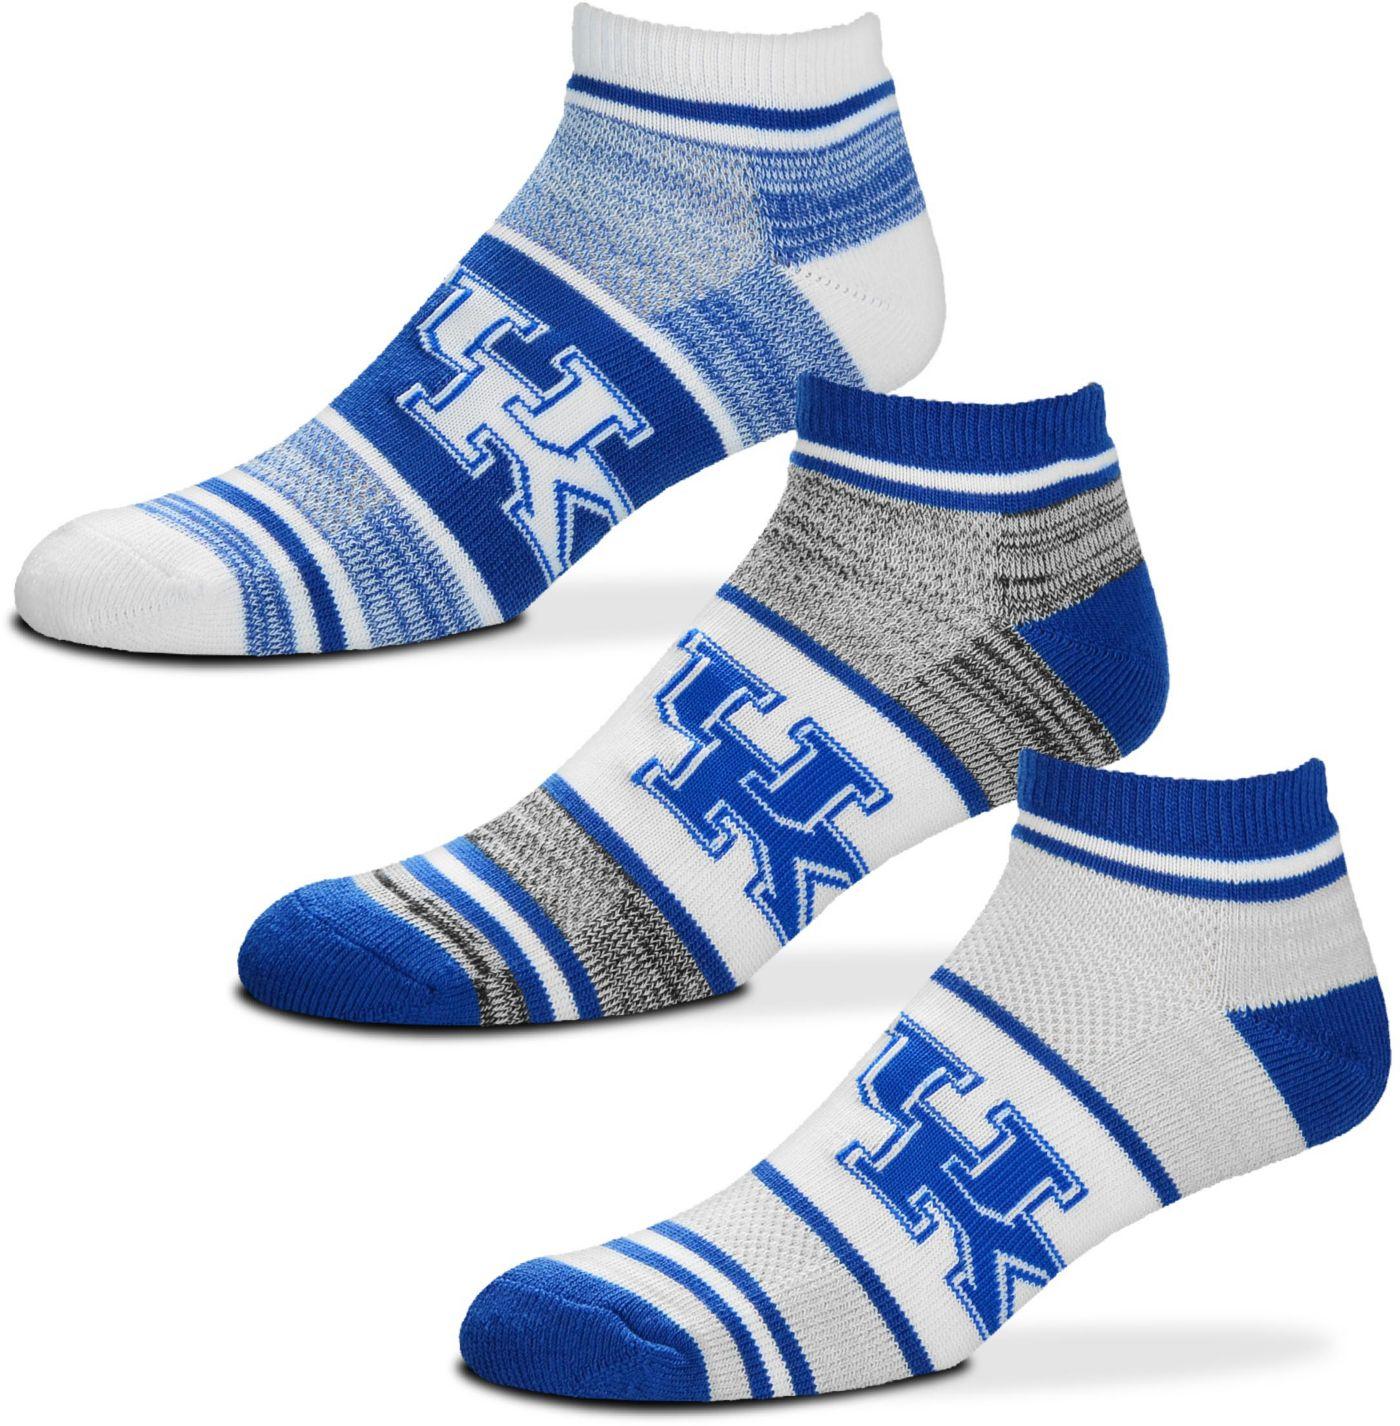 For Bare Feet Kentucky Wildcats 3 Pack Socks